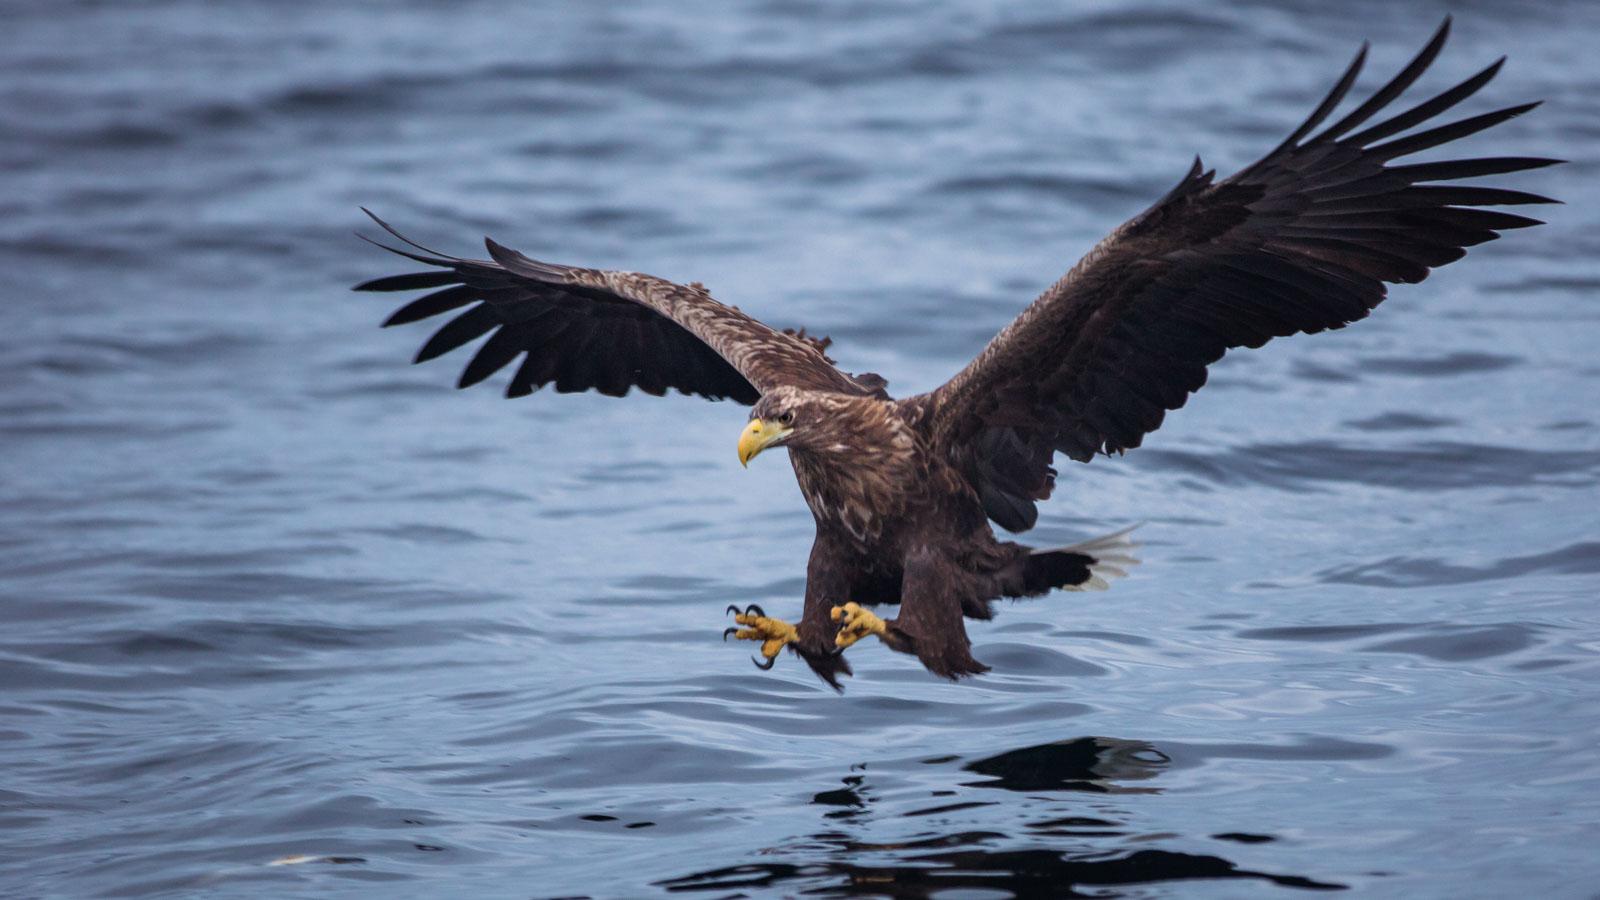 Sea eagle bird safari in Lofoten, Norway